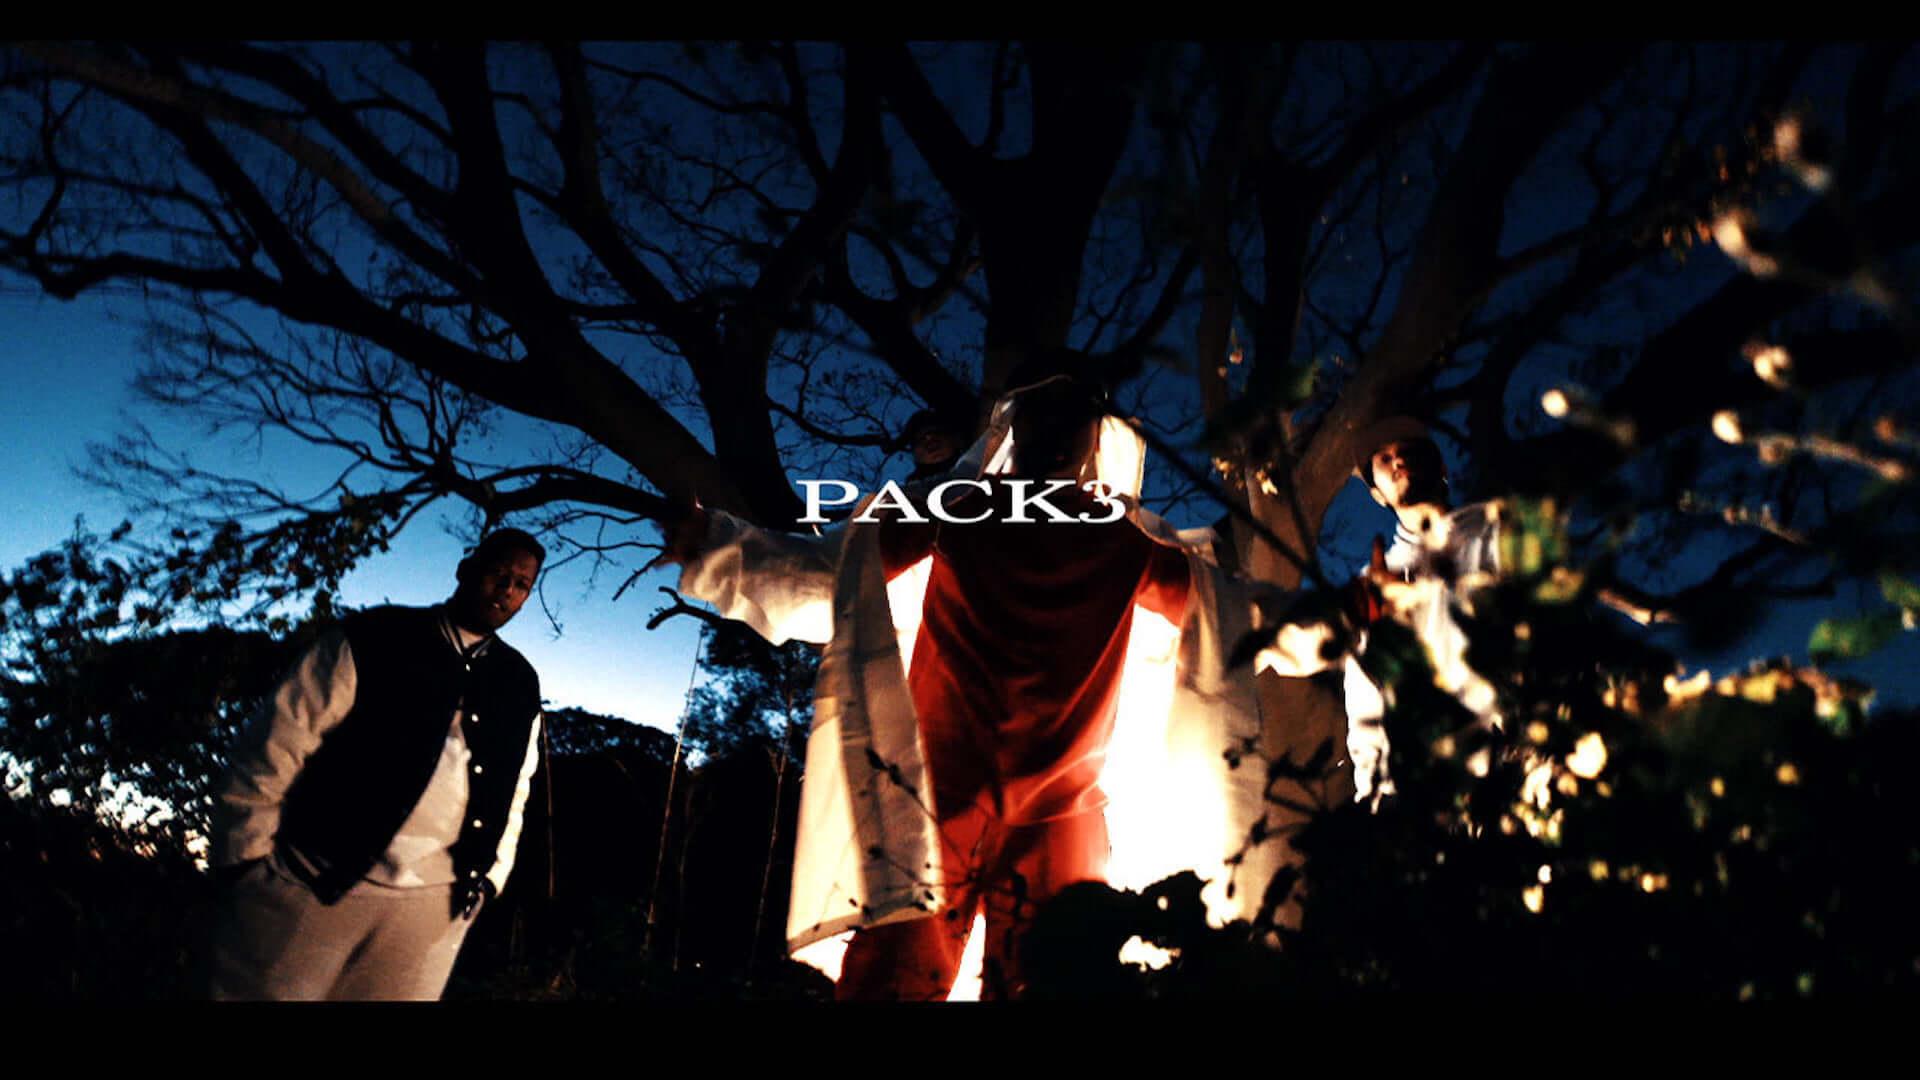 "BLABLA、Vue dumonde、m-alによるユニット・PACK3がデビューアルバム『PACKQAGE』のCDを本日発売!OMSB参加の楽曲""Discovery""MVも公開 music201216_pack3_3-1920x1080"